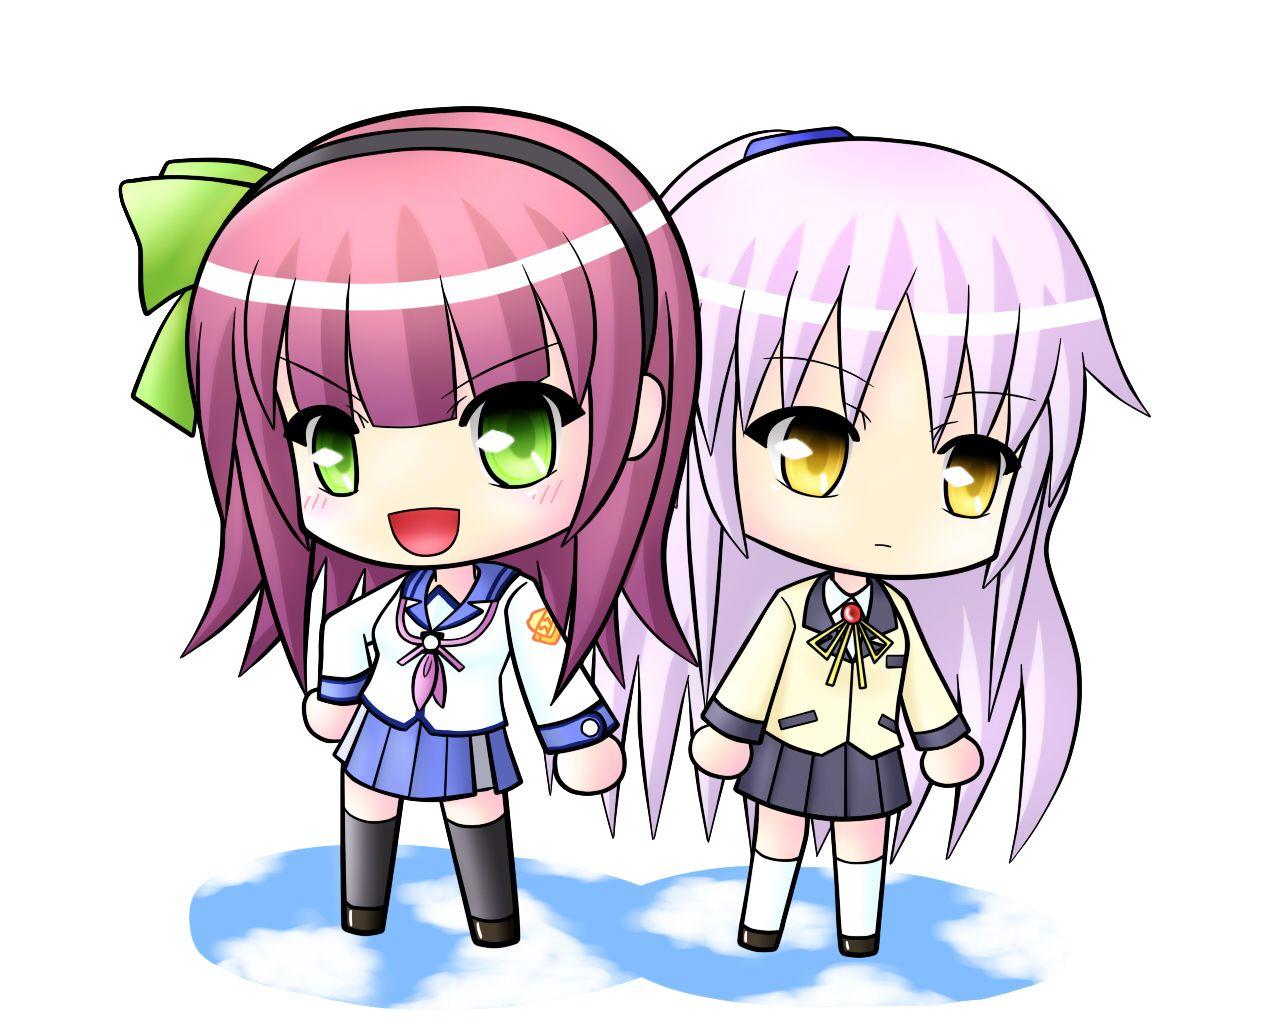 Kanade Yuri Computer Wallpapers Desktop Backgrounds 1280x1024 Id 155658 Angel Beats Anime Angel Beats Anime